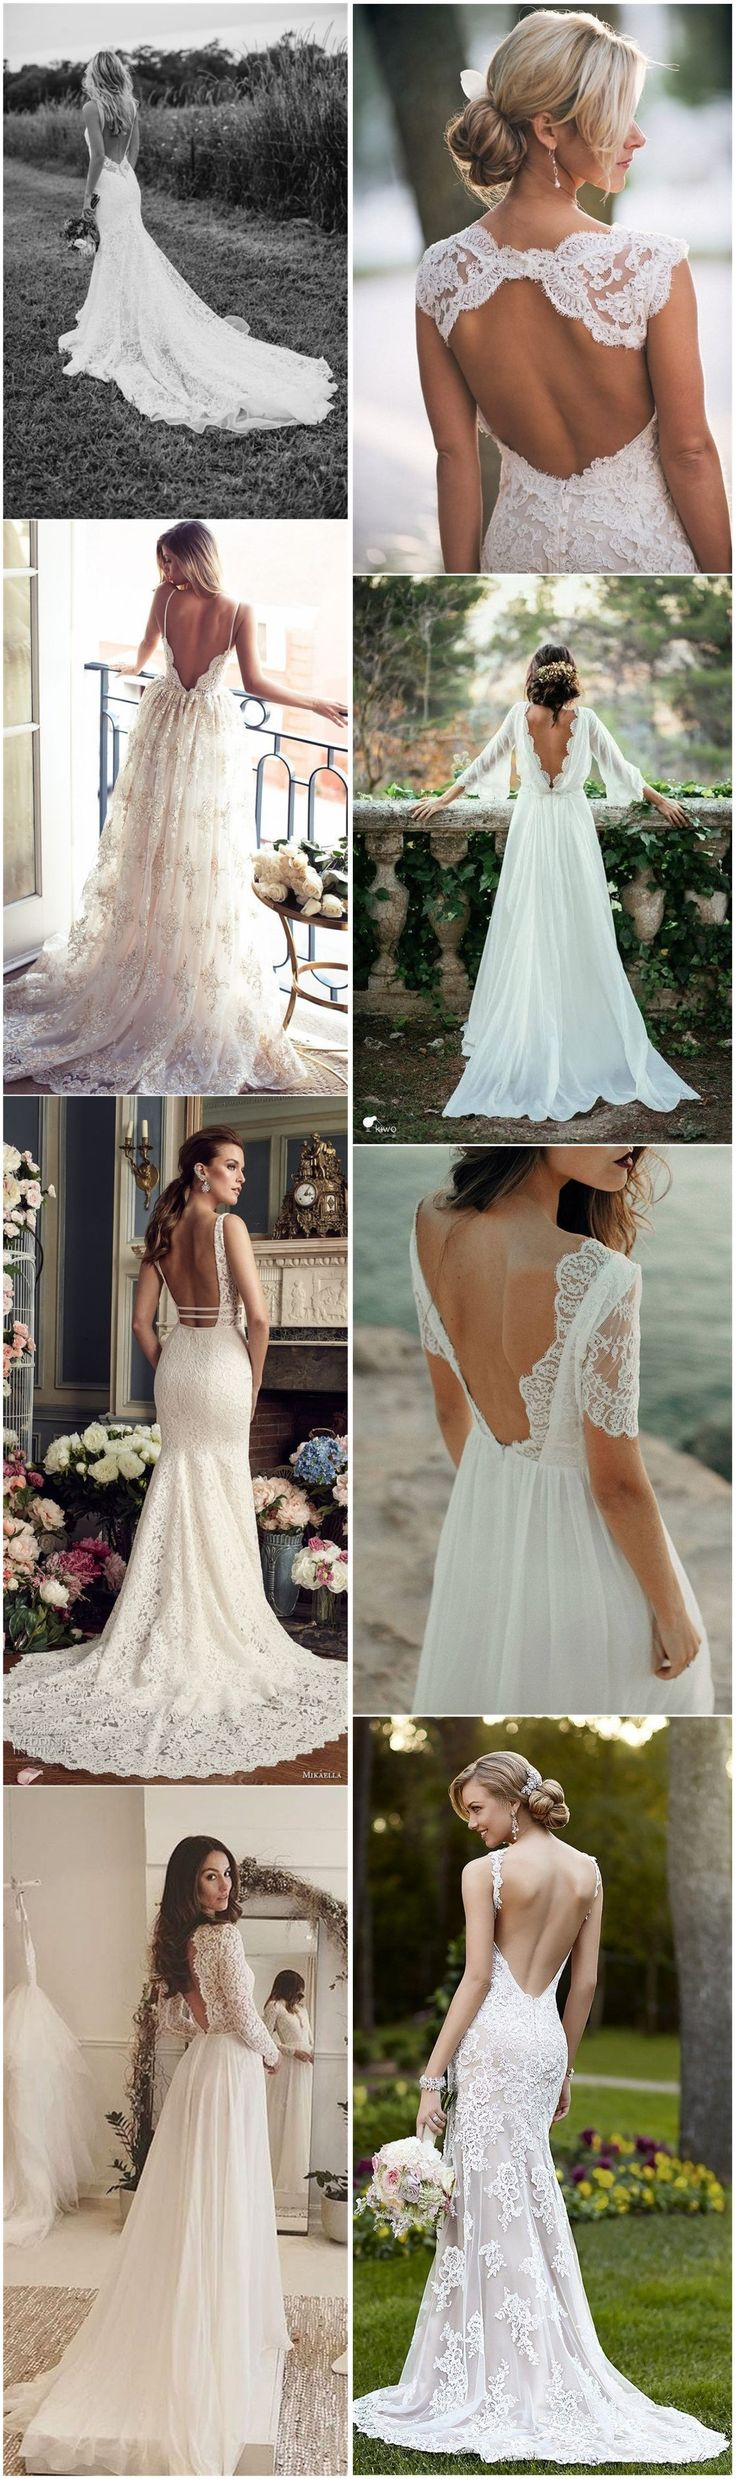 Wedding Dresses»34 Stunning Open Back Wedding Dresses That Wow